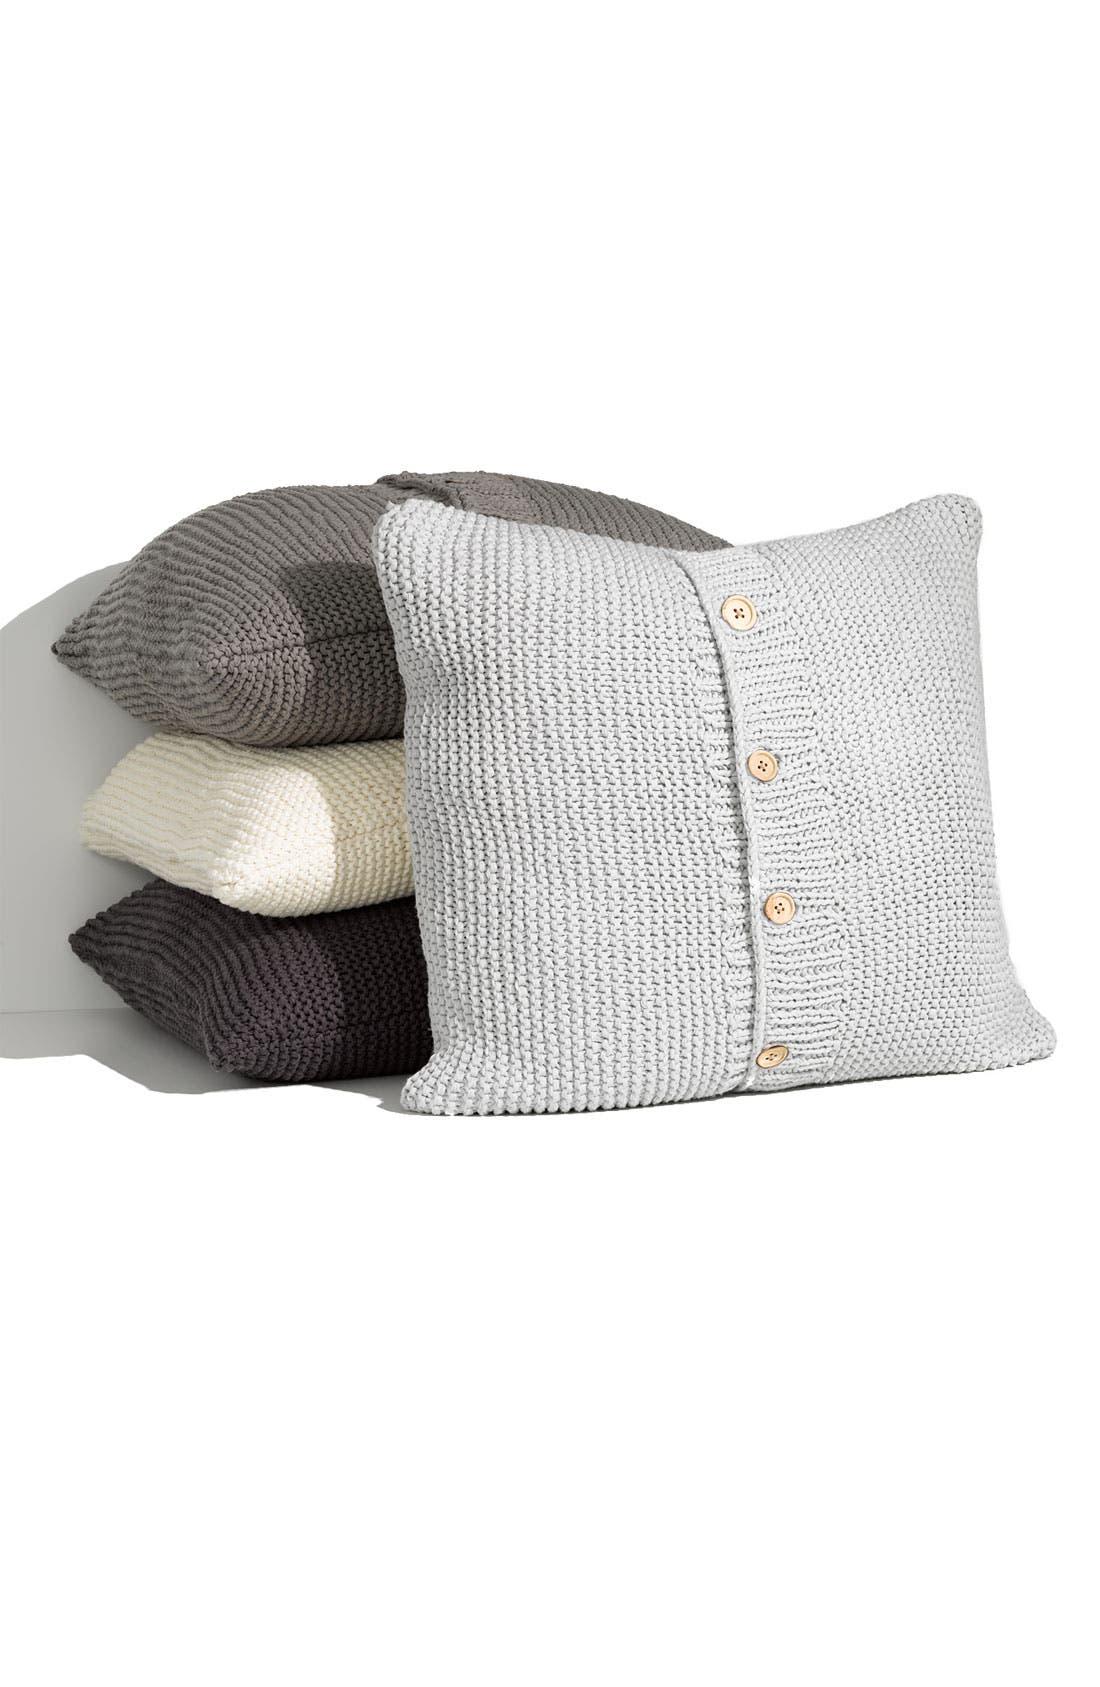 Main Image - Nordstrom Chunky Knit Euro Pillow Sham